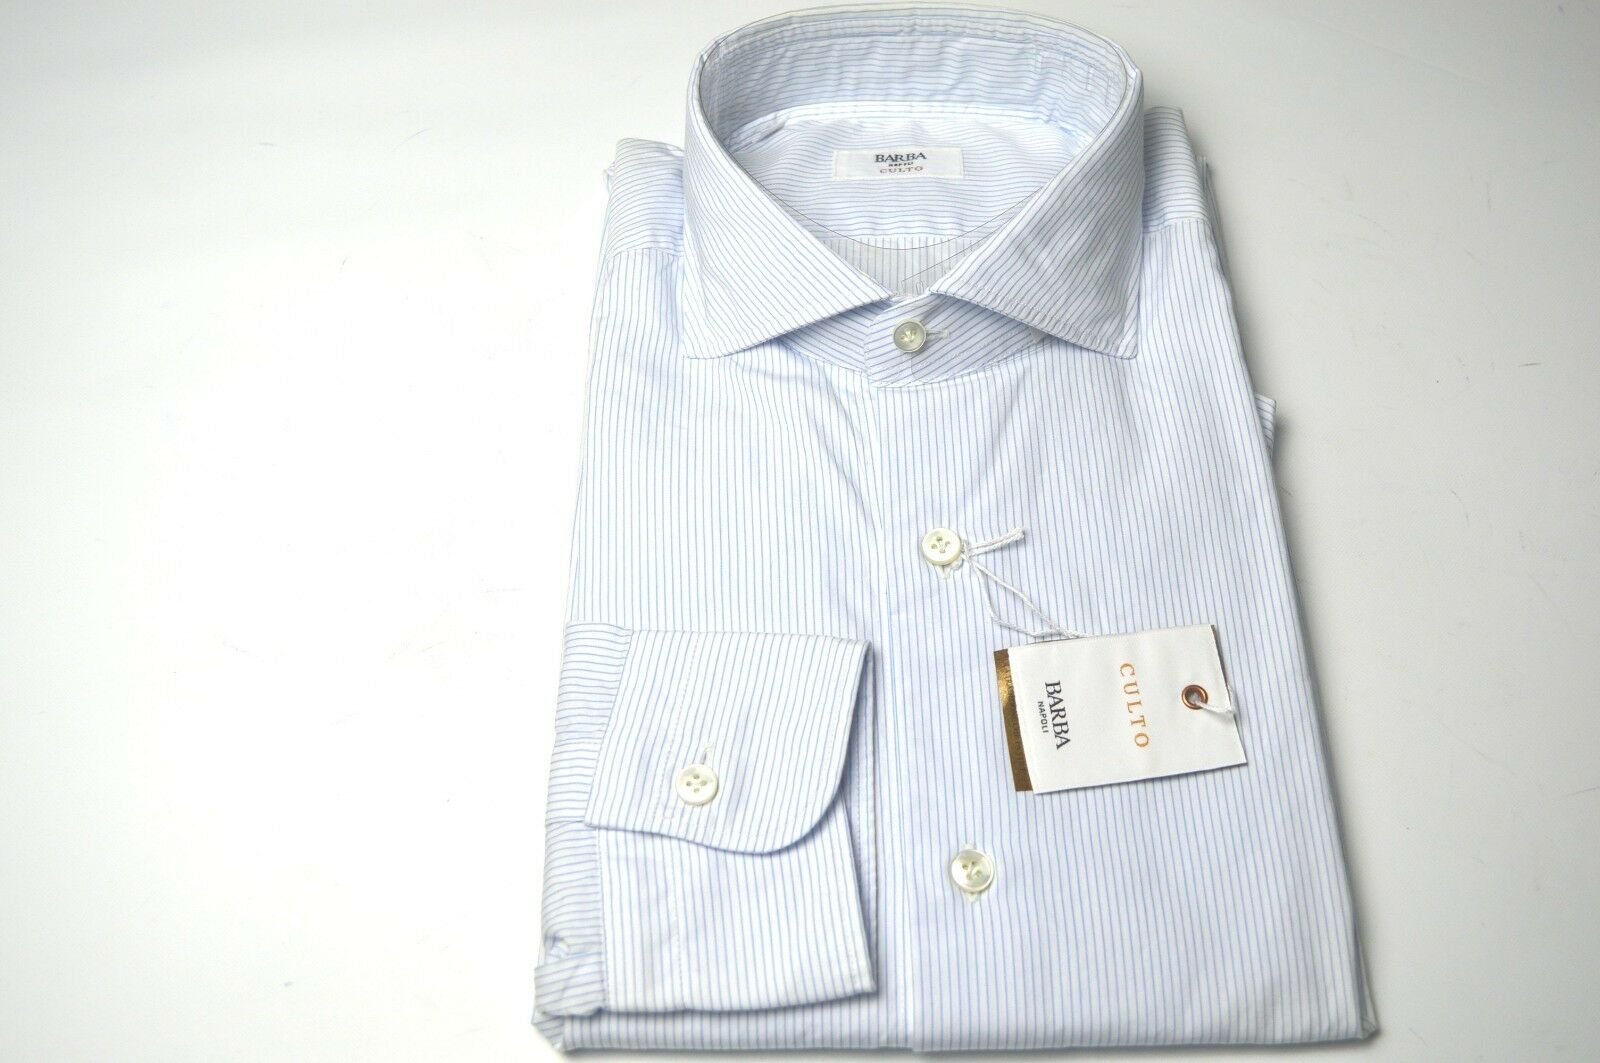 NEW BARBA  Dress SHIRT  100% Cotton Size 16.5  Us 42 Eu  (BA26)